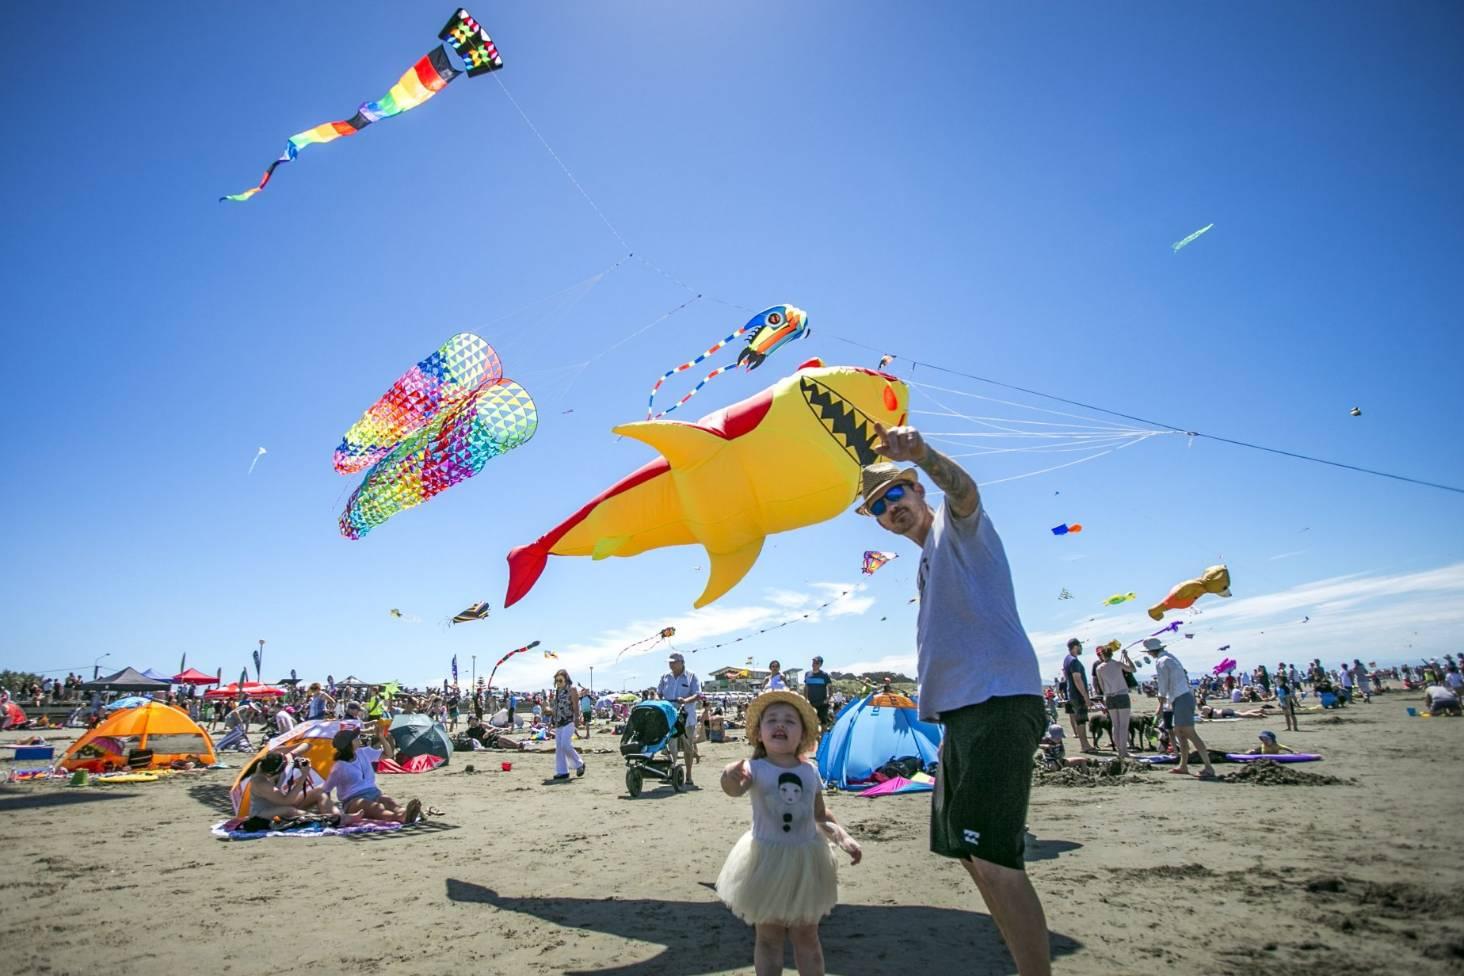 130b8e3f7 Summer scorcher for Kite Day-goers at New Brighton Beach   Stuff.co.nz